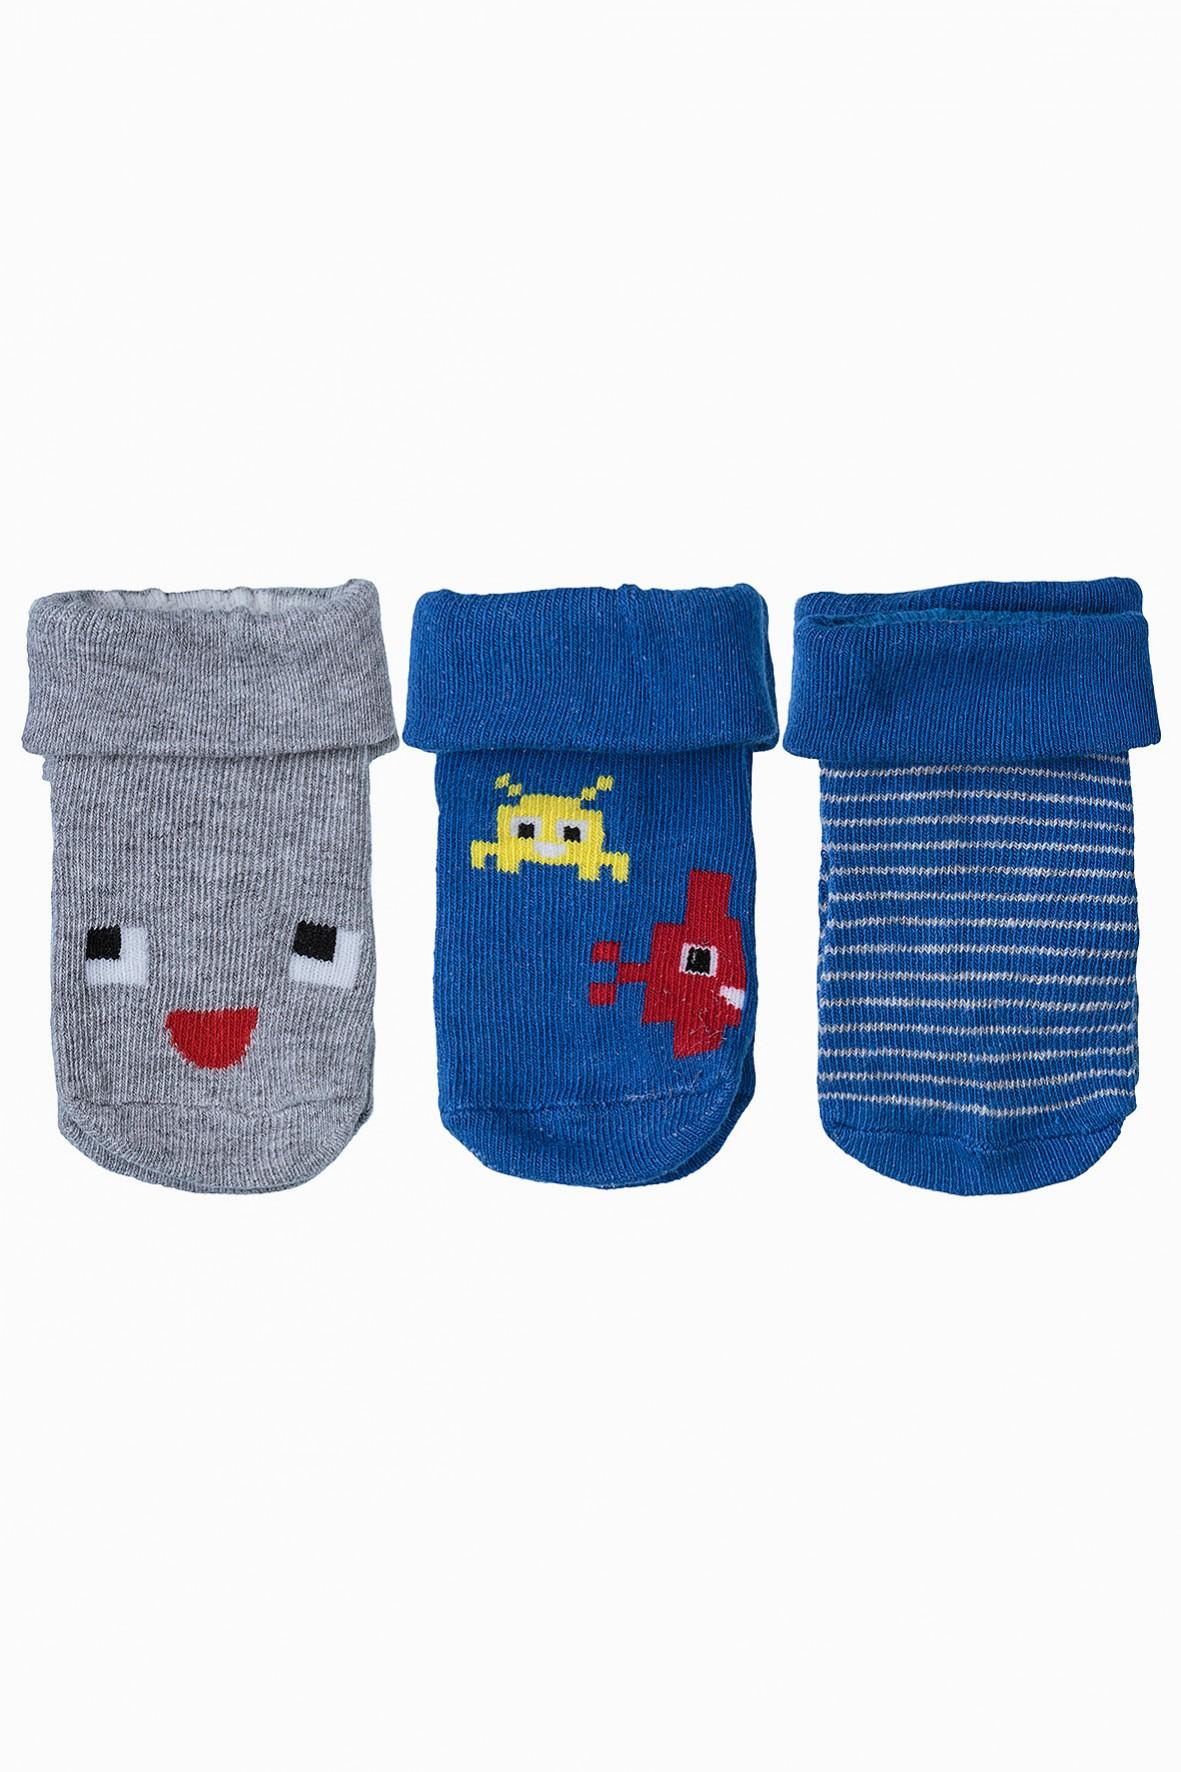 Skarpetki dla chłopca- 3pak